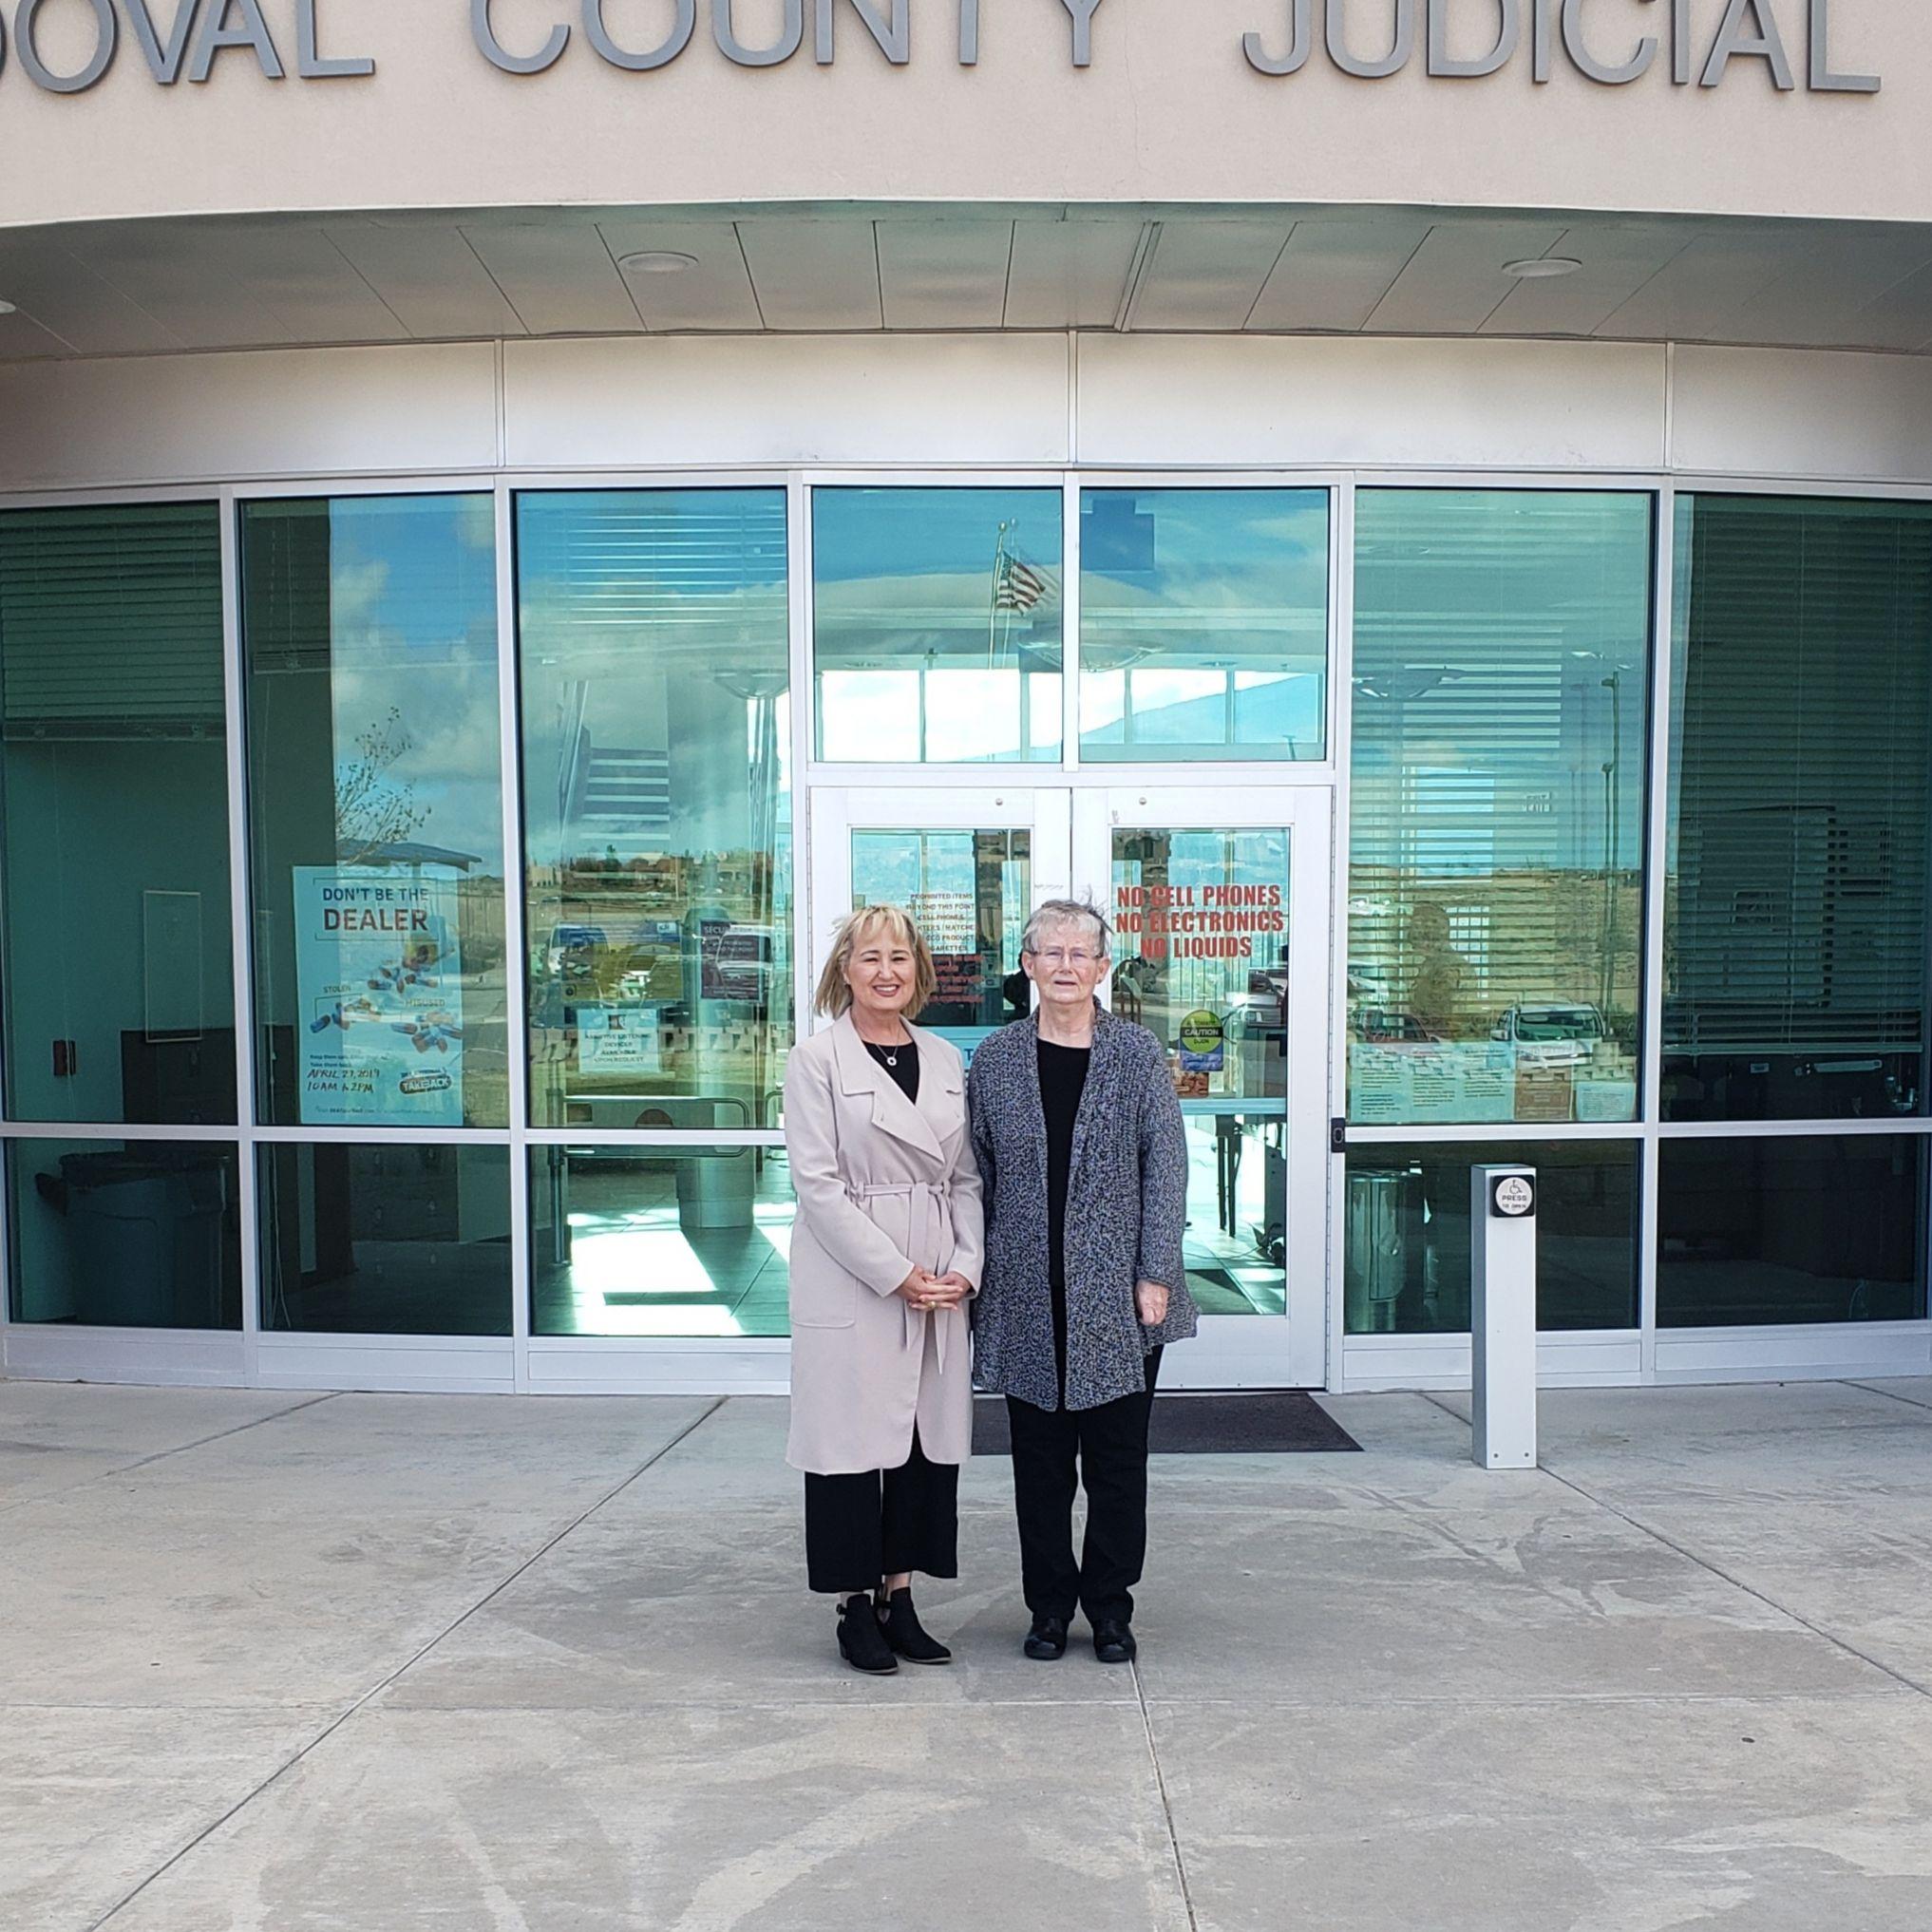 New Sandoval County CASAs!